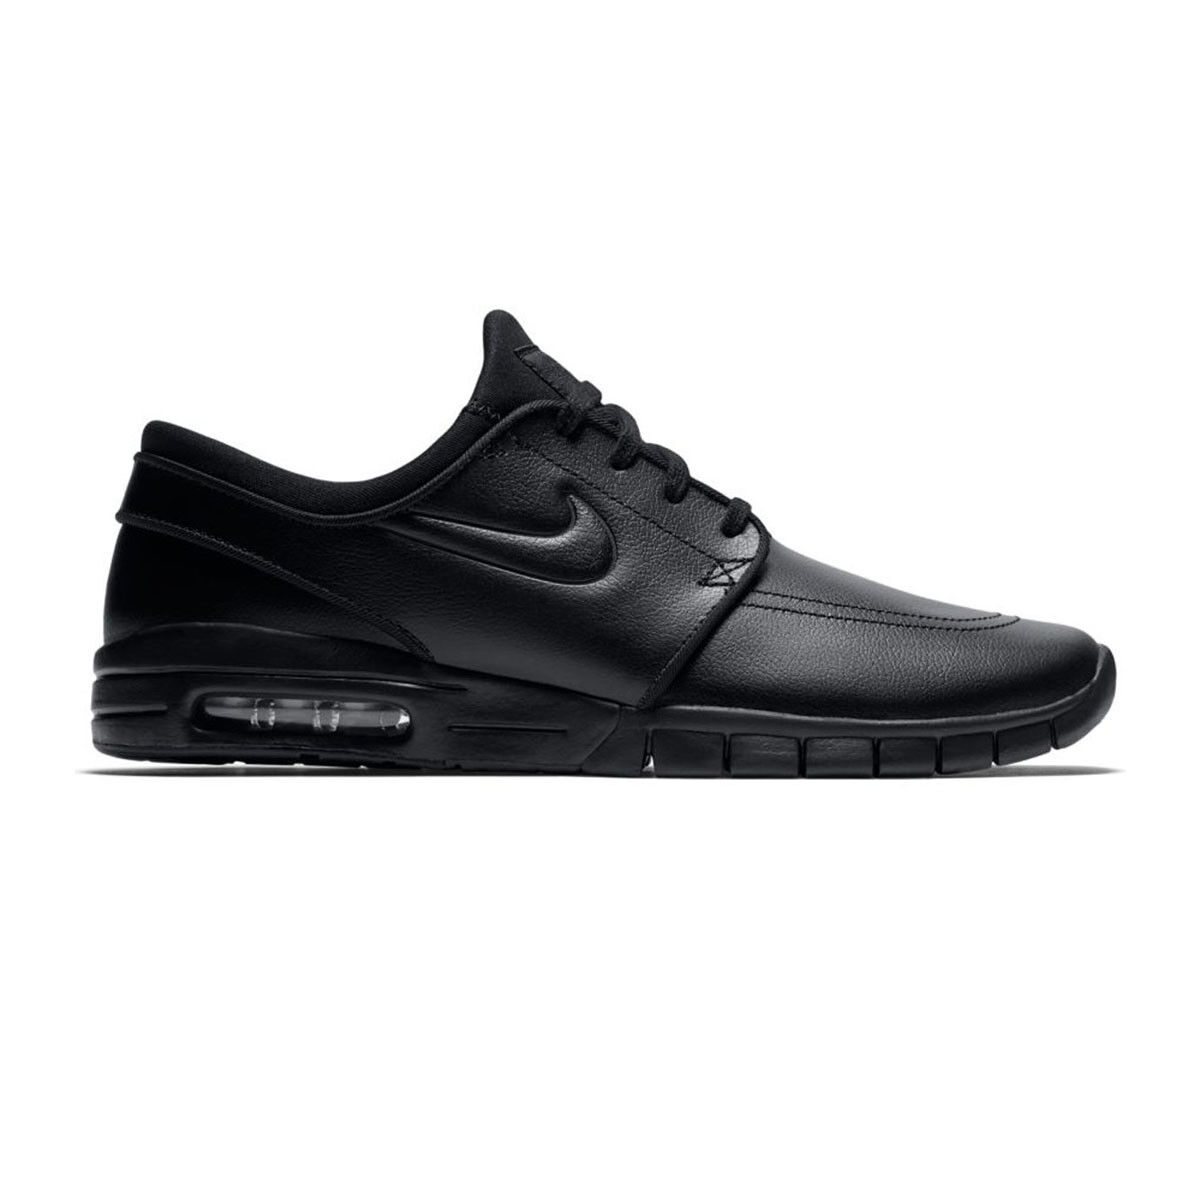 Nike SB Stefan Janoski Max Leather (Black) 685299-009 Size 8.5 UK